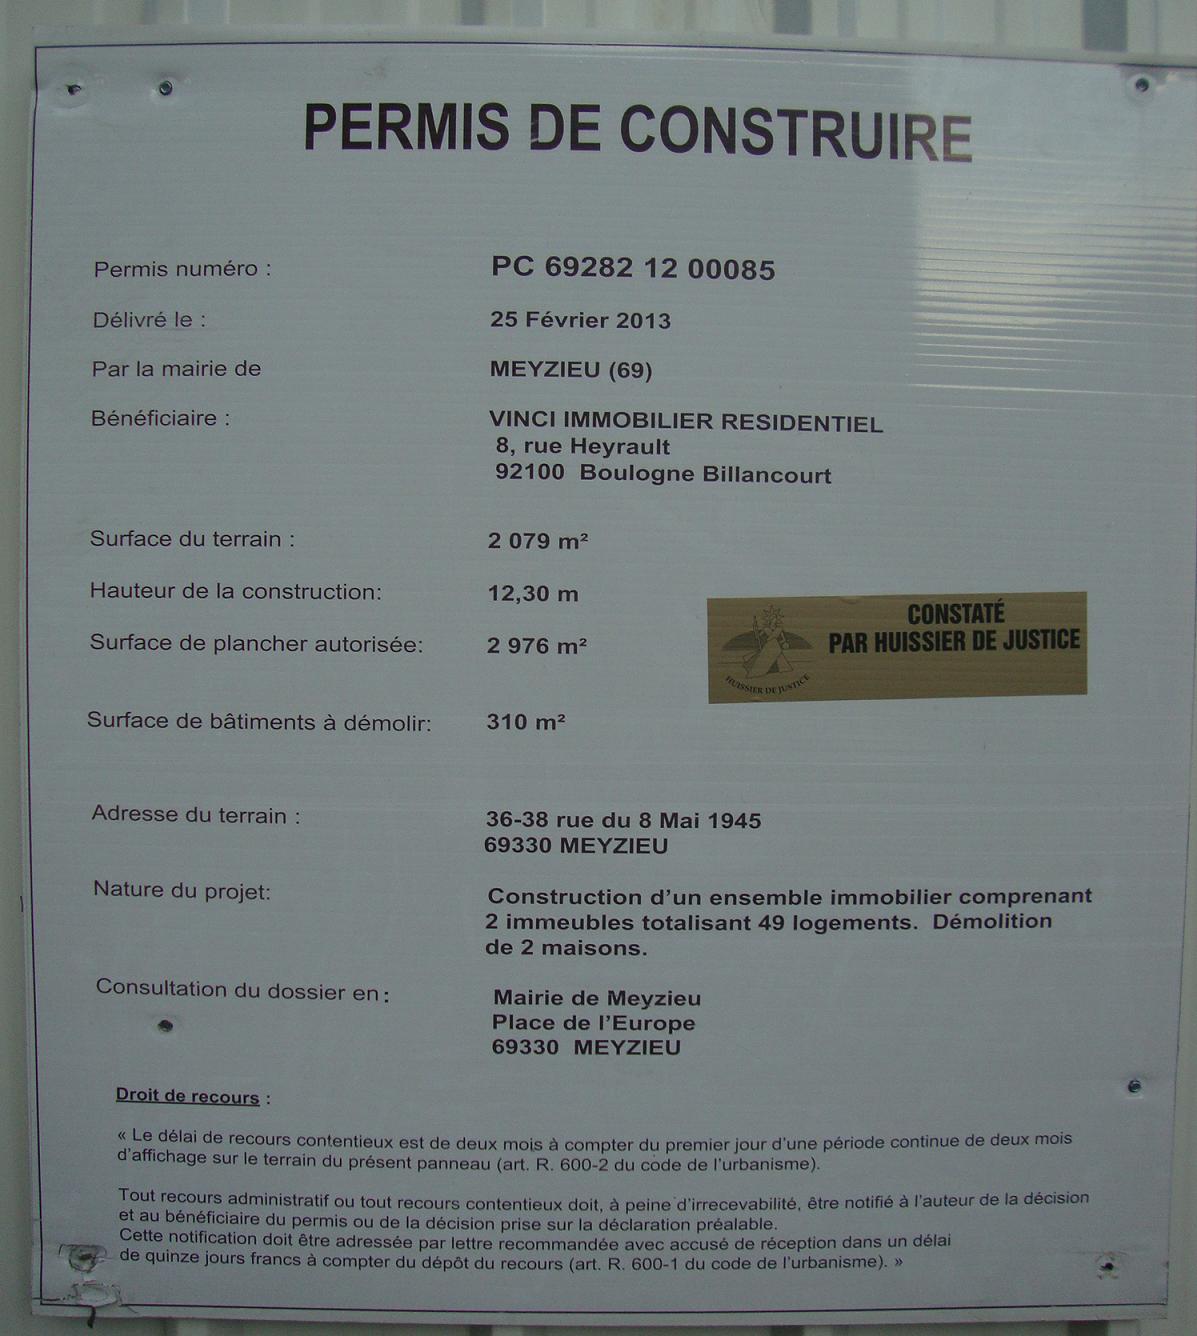 Meyzieu skyscrapercity for Agrandissement fenetre permis de construire